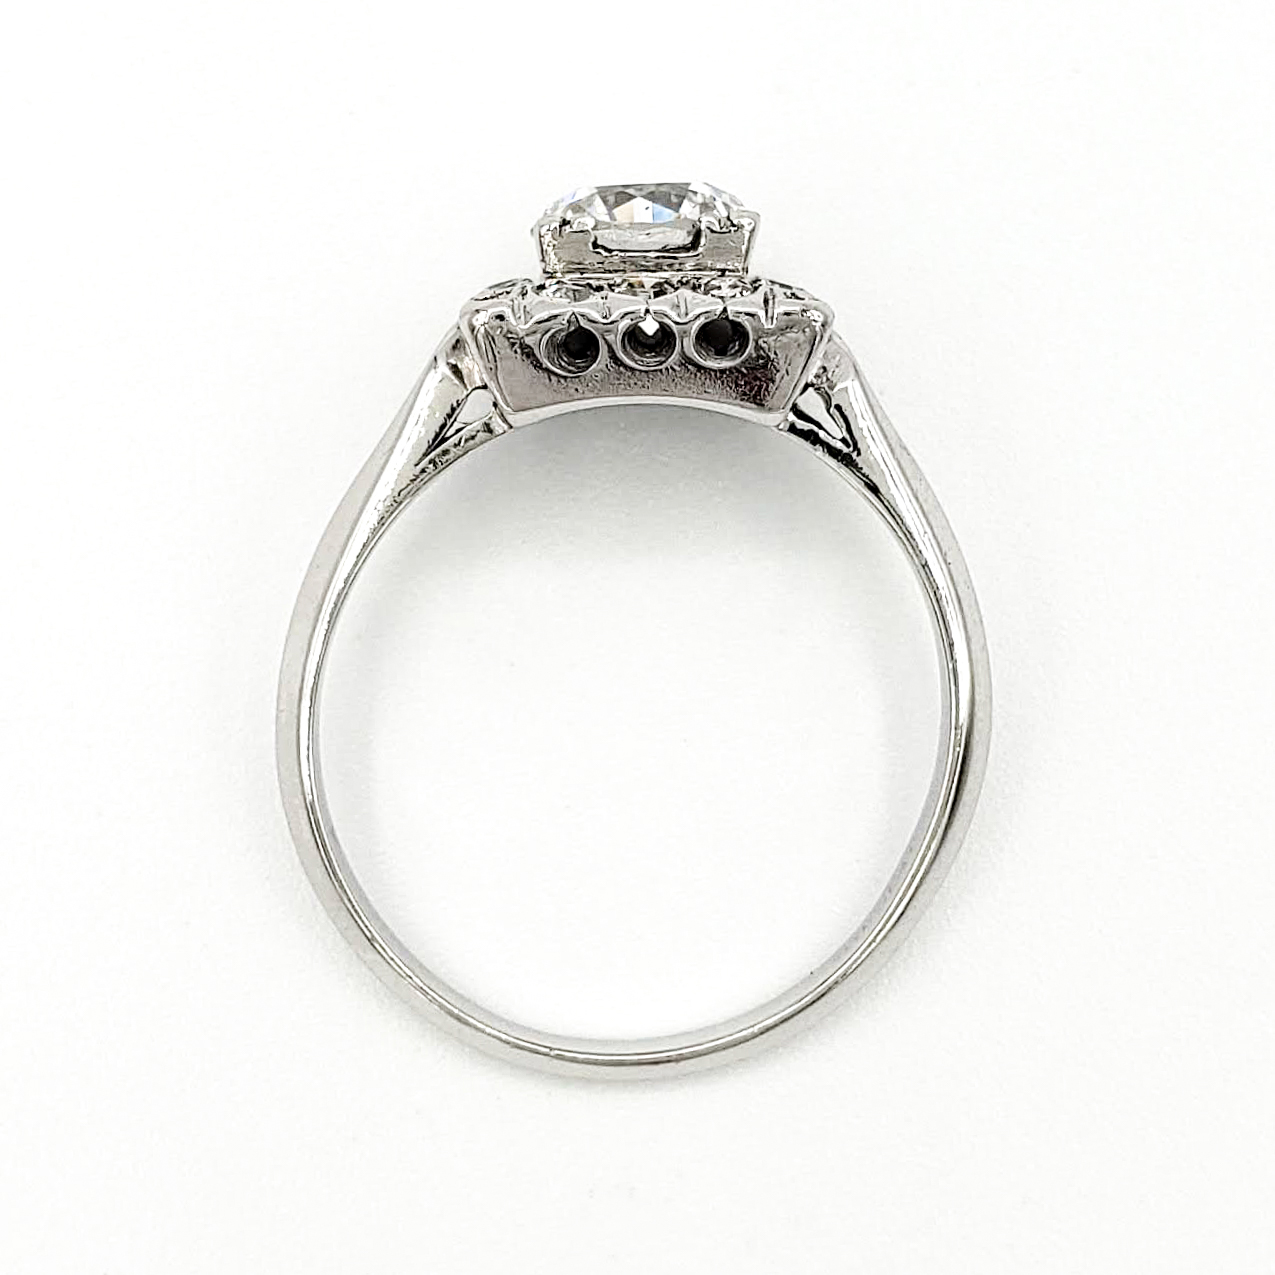 vintage-platinum-engagement-ring-with-1-10-carat-round-brilliant-cut-diamond-egl-d-vs2